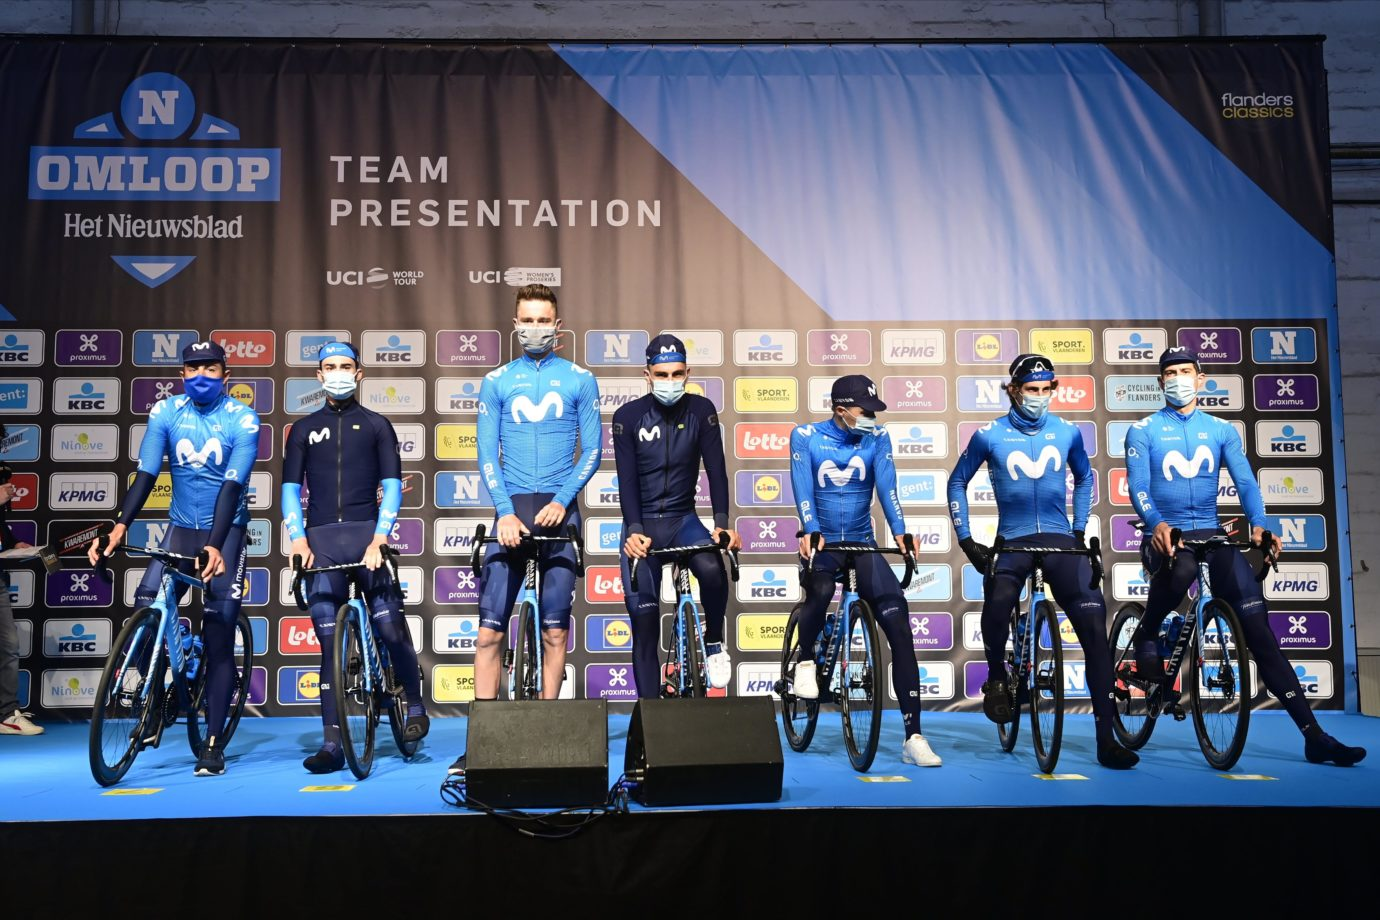 News' image'Gran imagen 'azul' en Bélgica; Cortina, 11º'